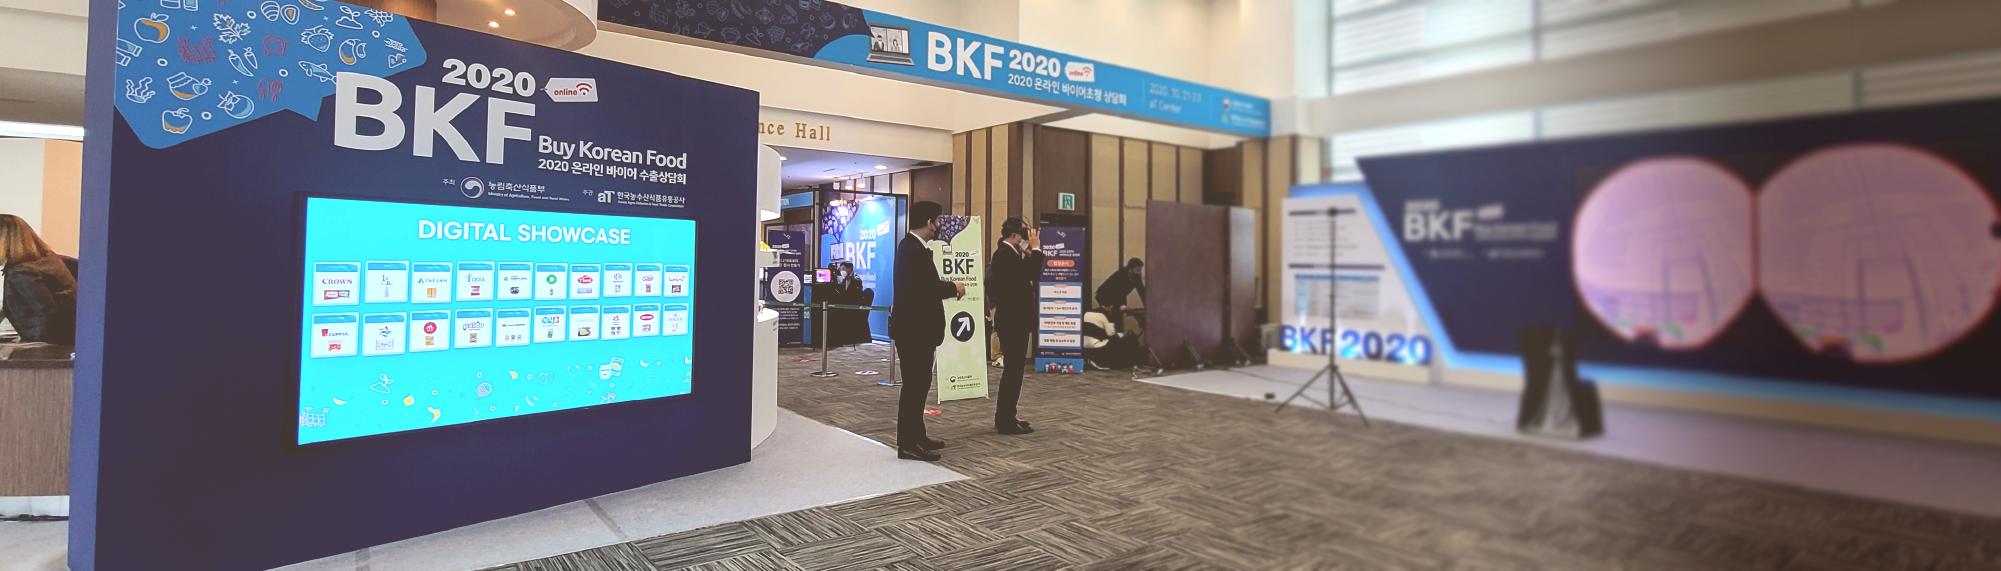 2020 BKF 온라인 바이어 수출상담회